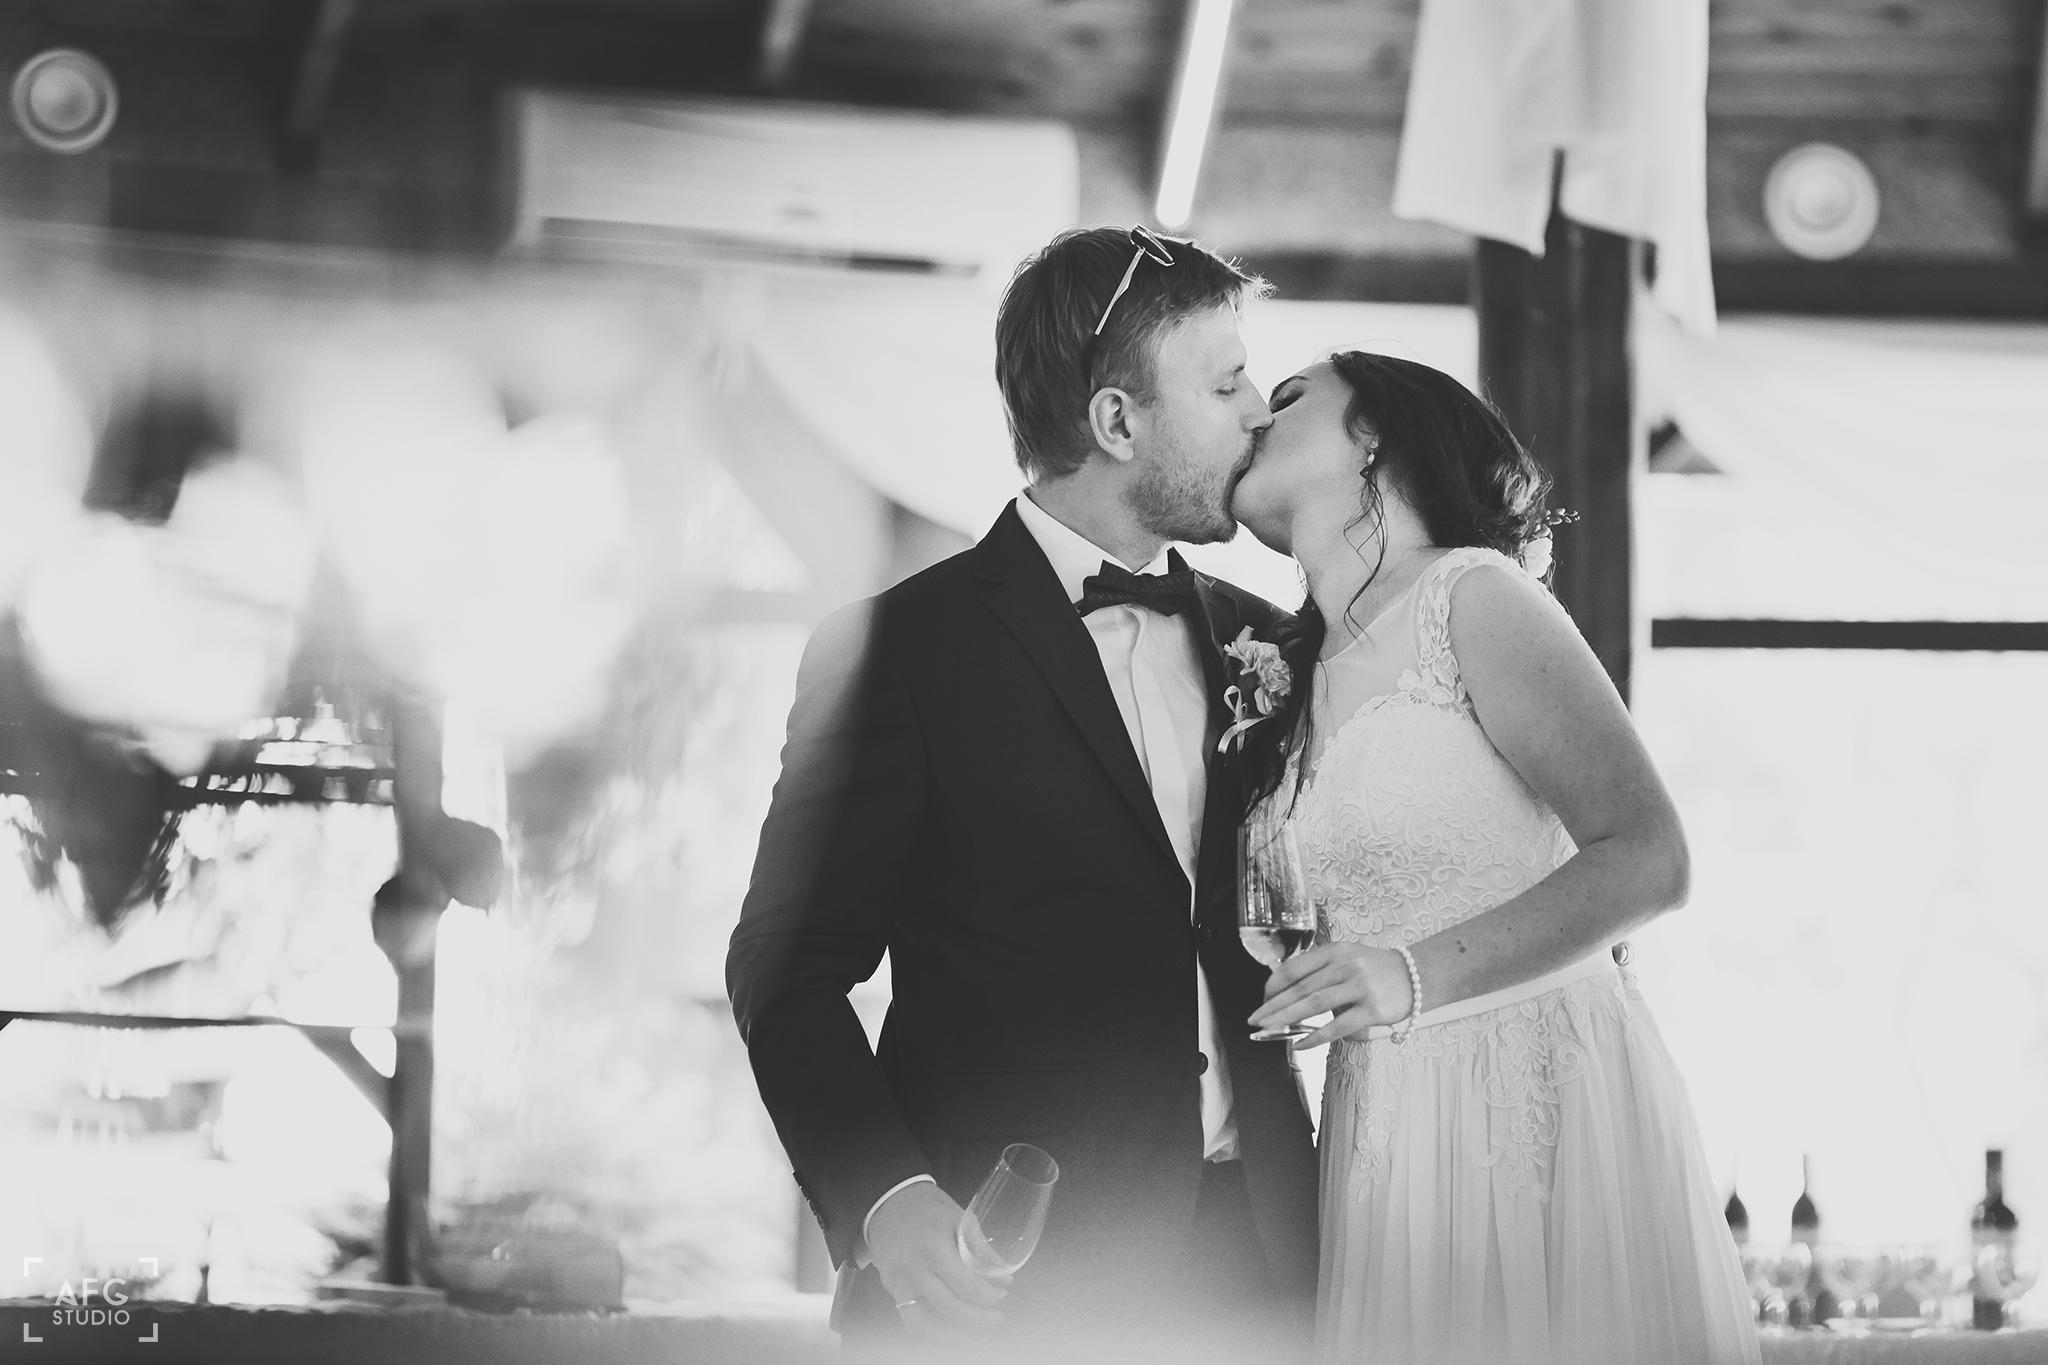 pocałunek, wesele, toast